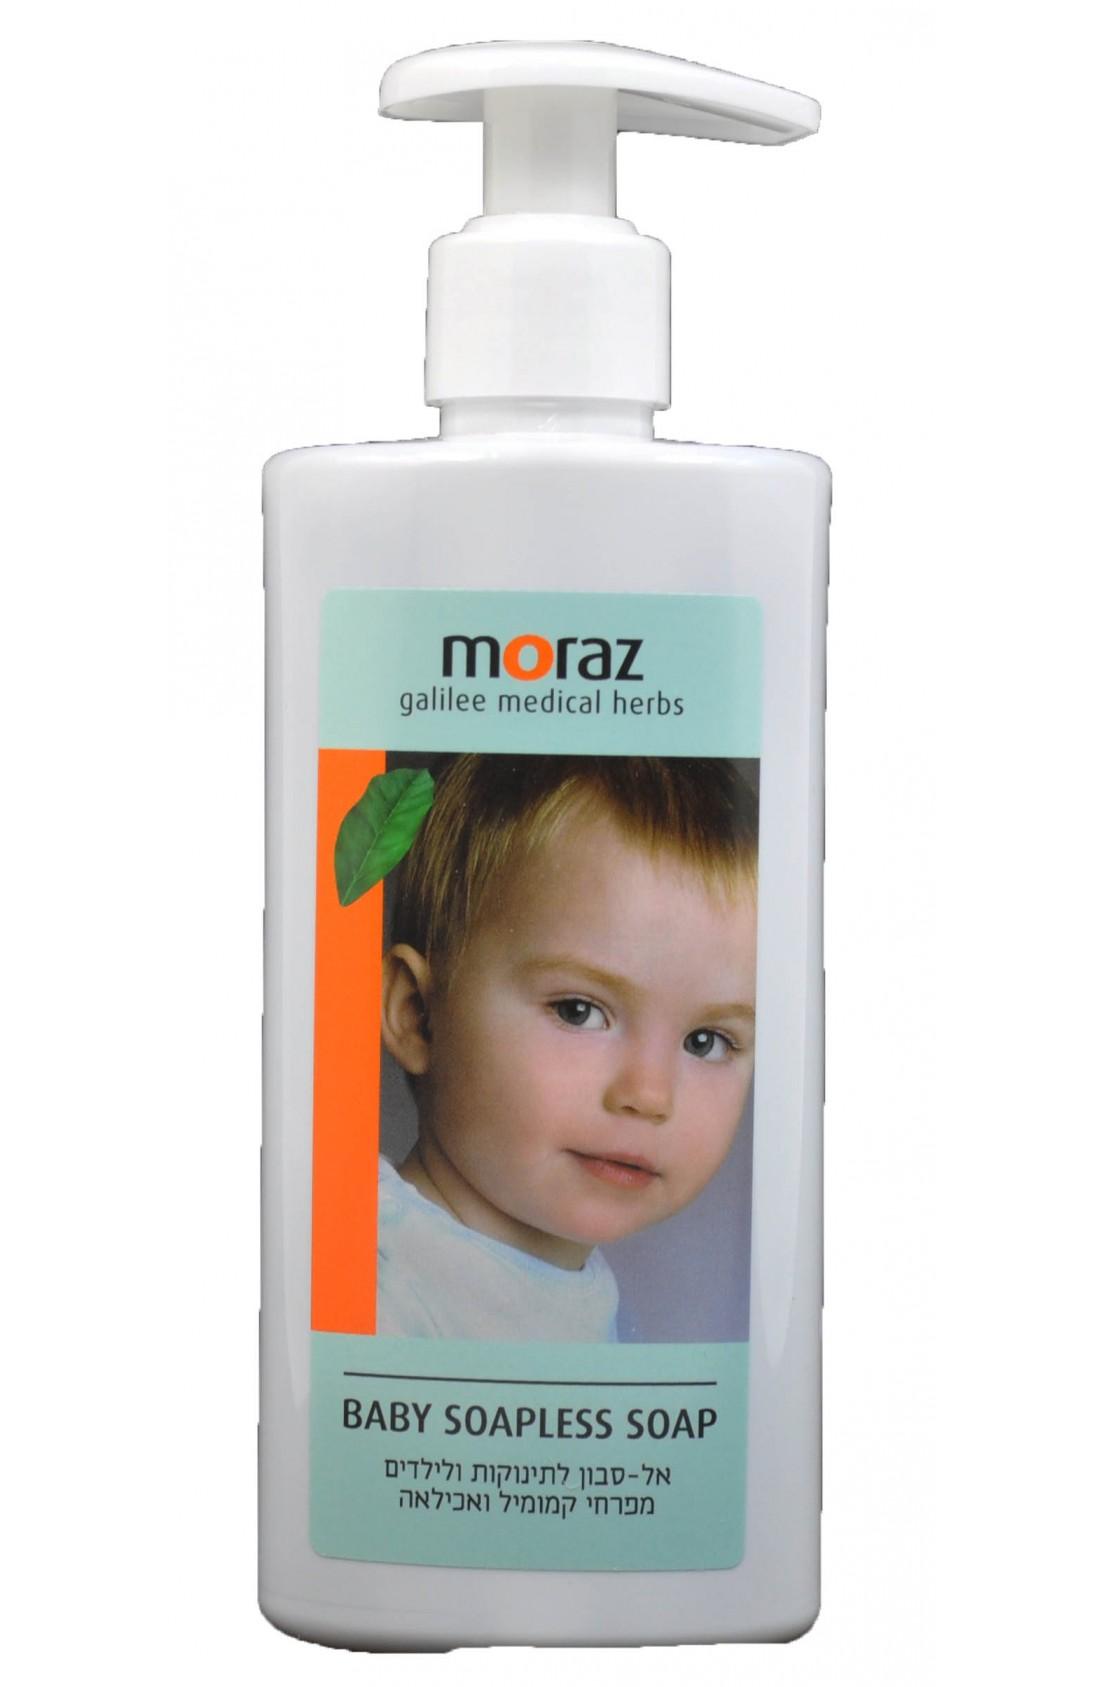 Moraz Organic Baby Soapless Soap // 250ml